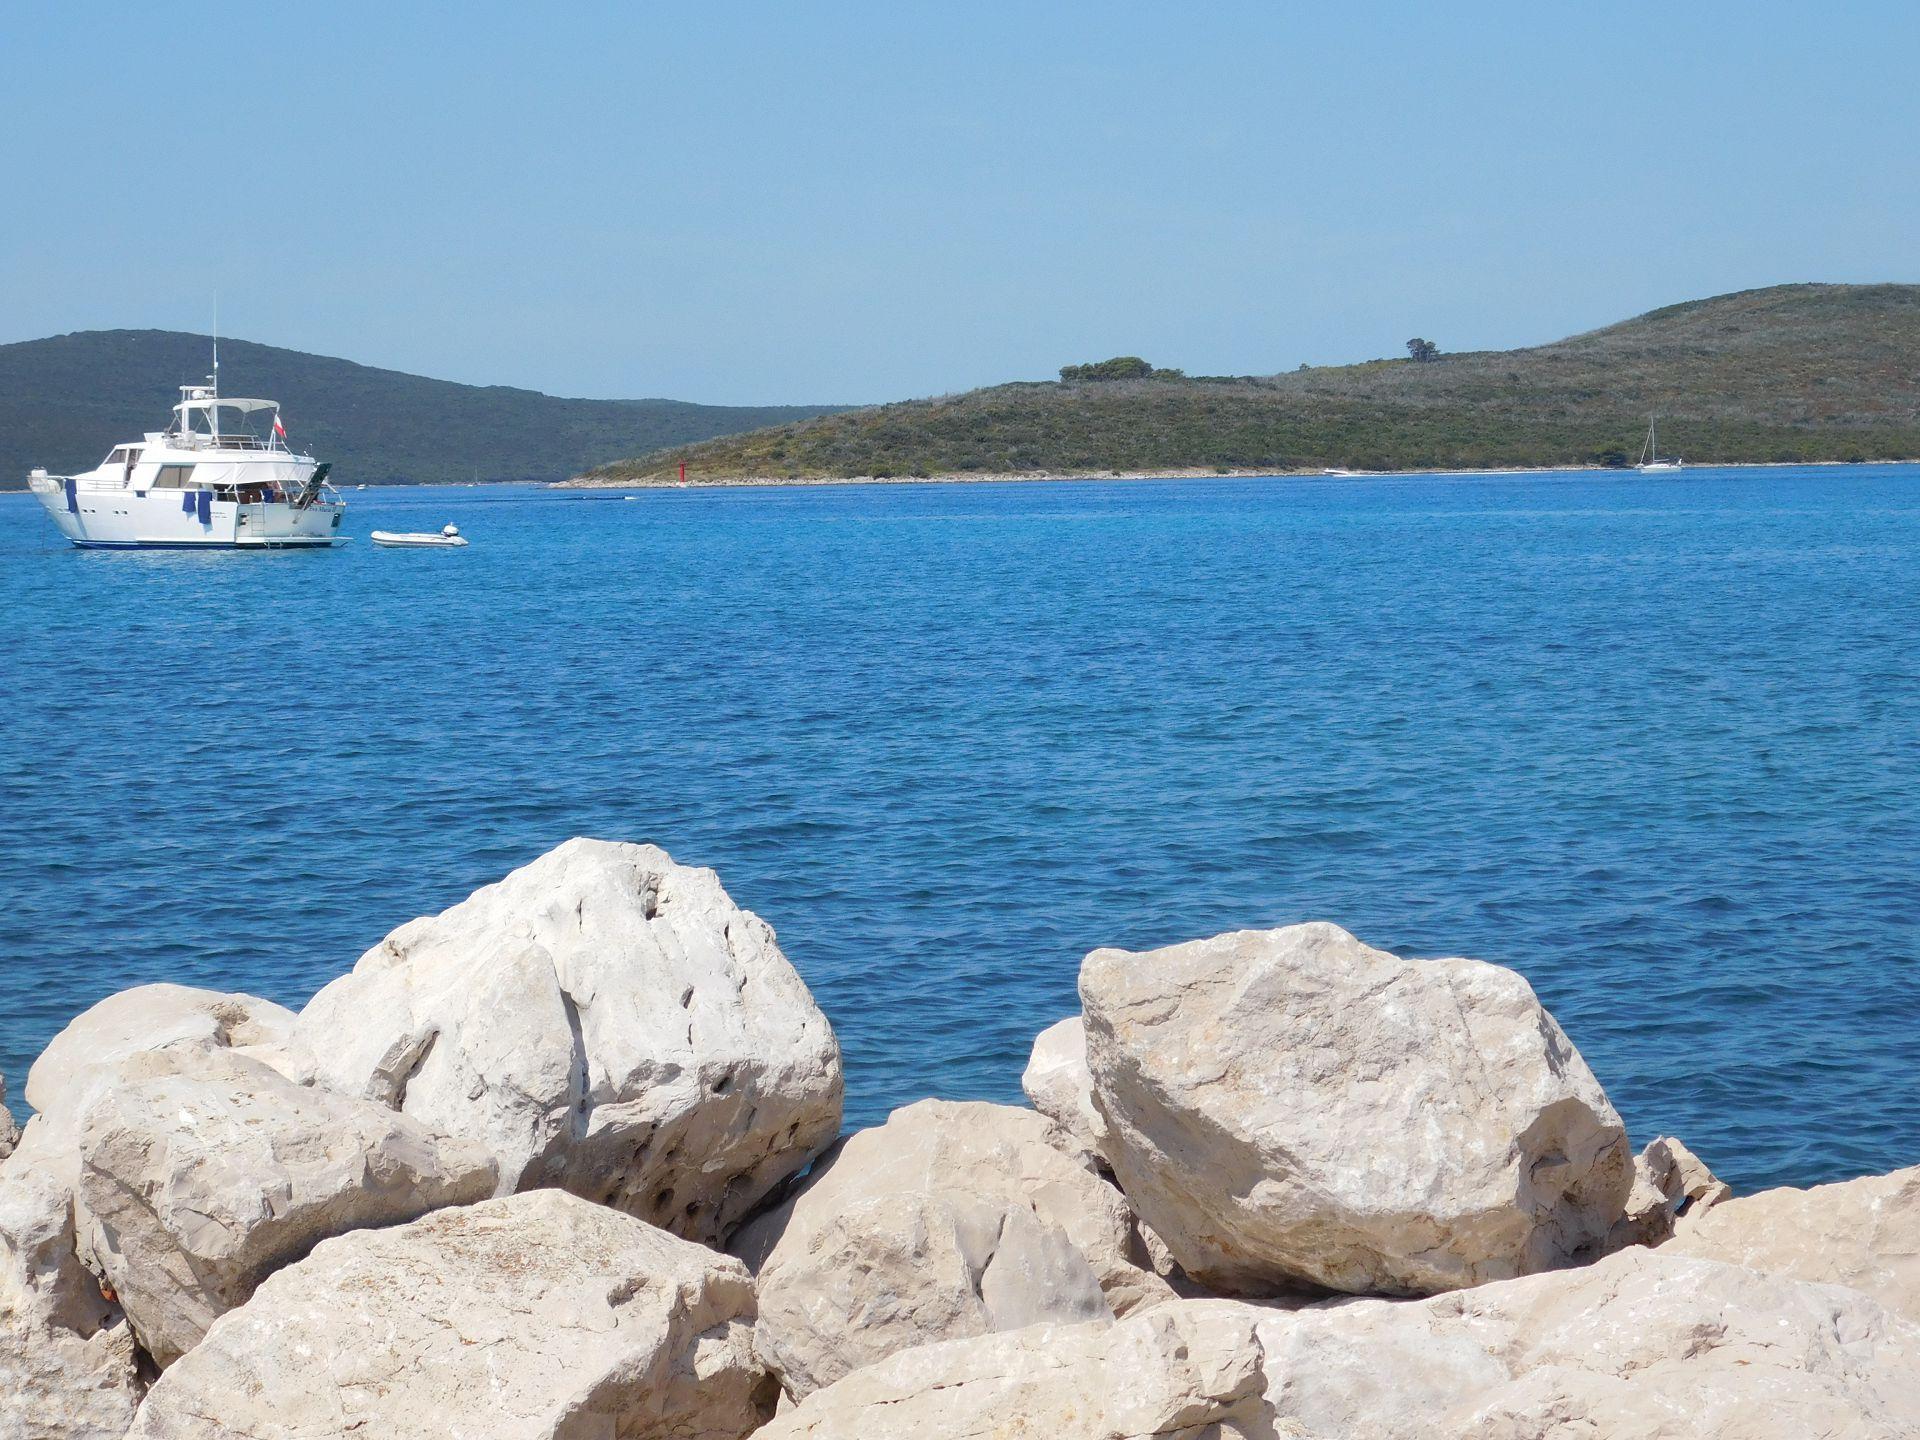 Ferienwohnung Lado SA1(2+1) - Muline (741846), Ugljan, Insel Ugljan, Dalmatien, Kroatien, Bild 10